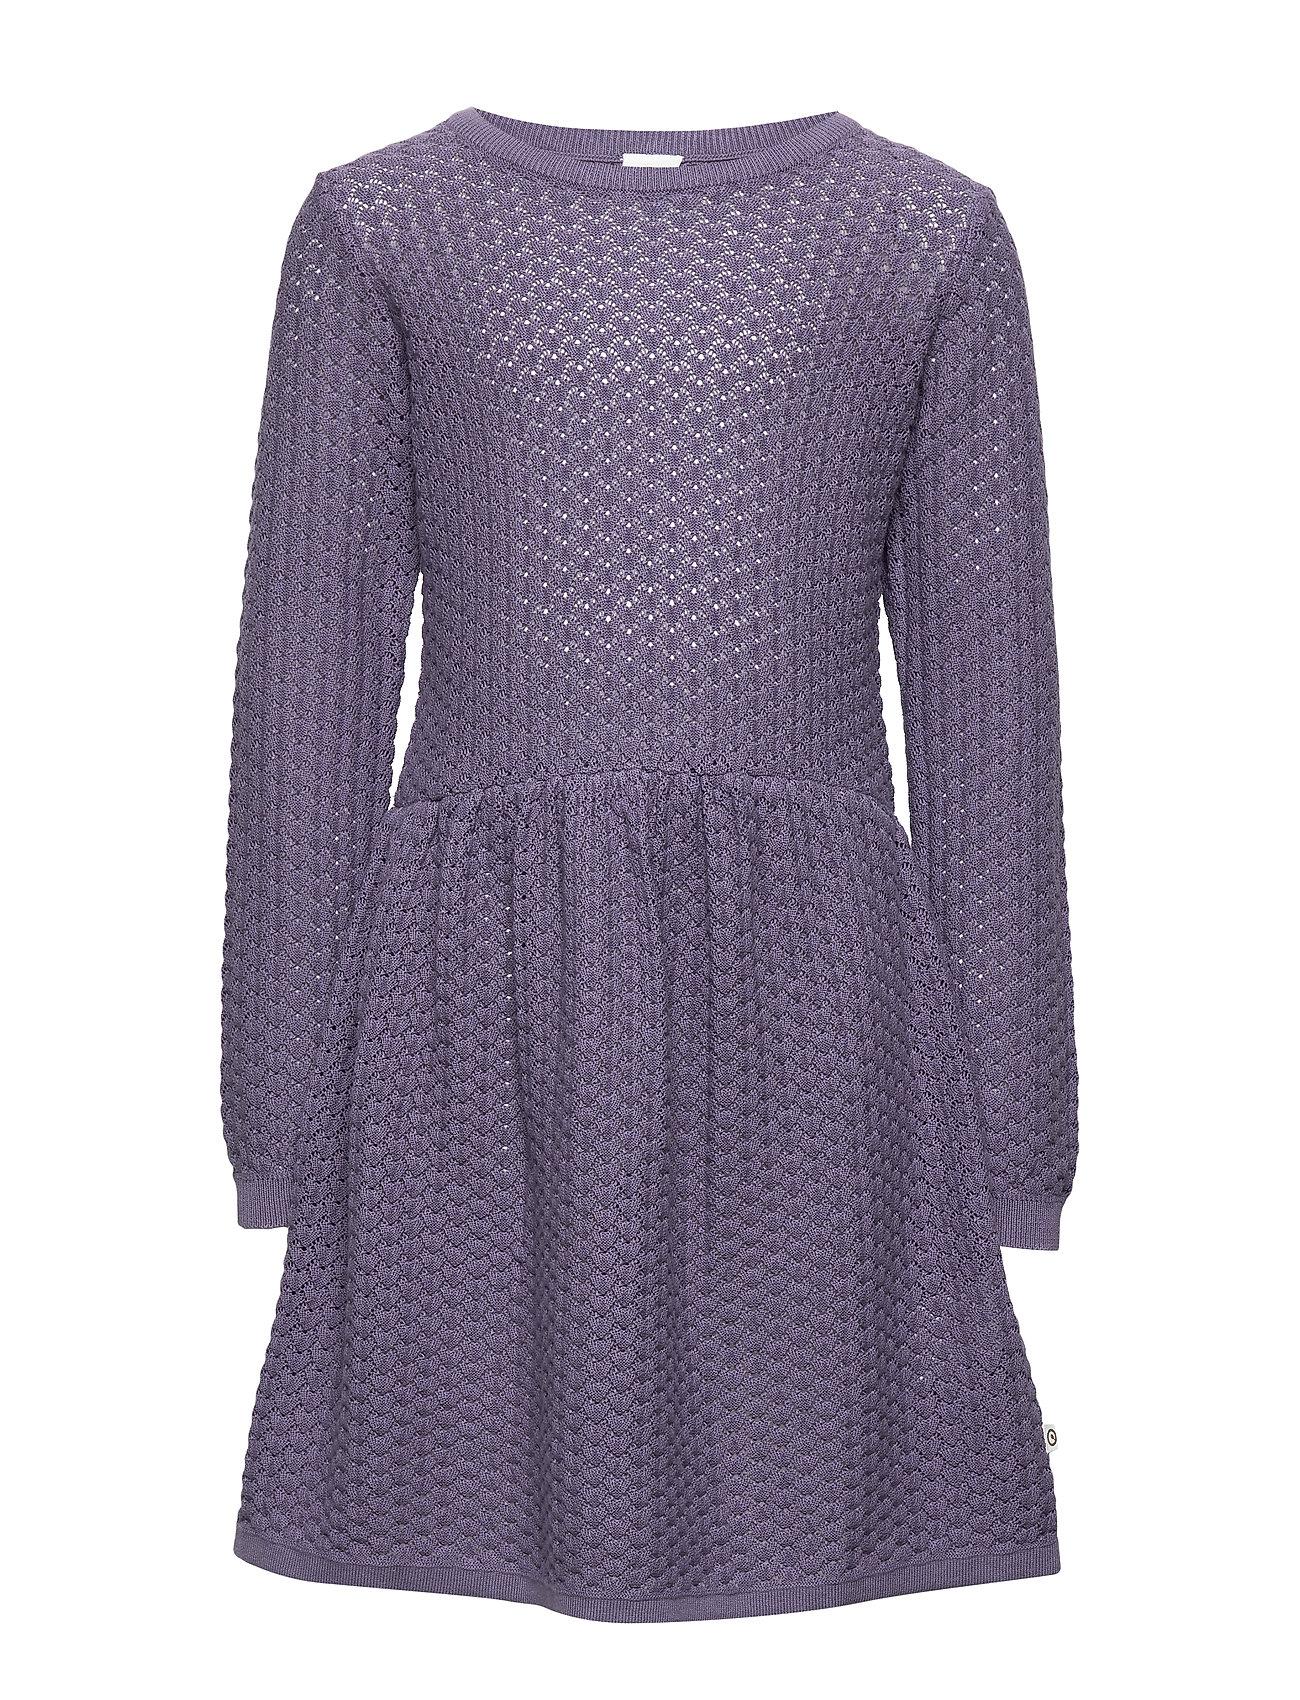 Müsli by Green Cotton Knit dress - TULIP